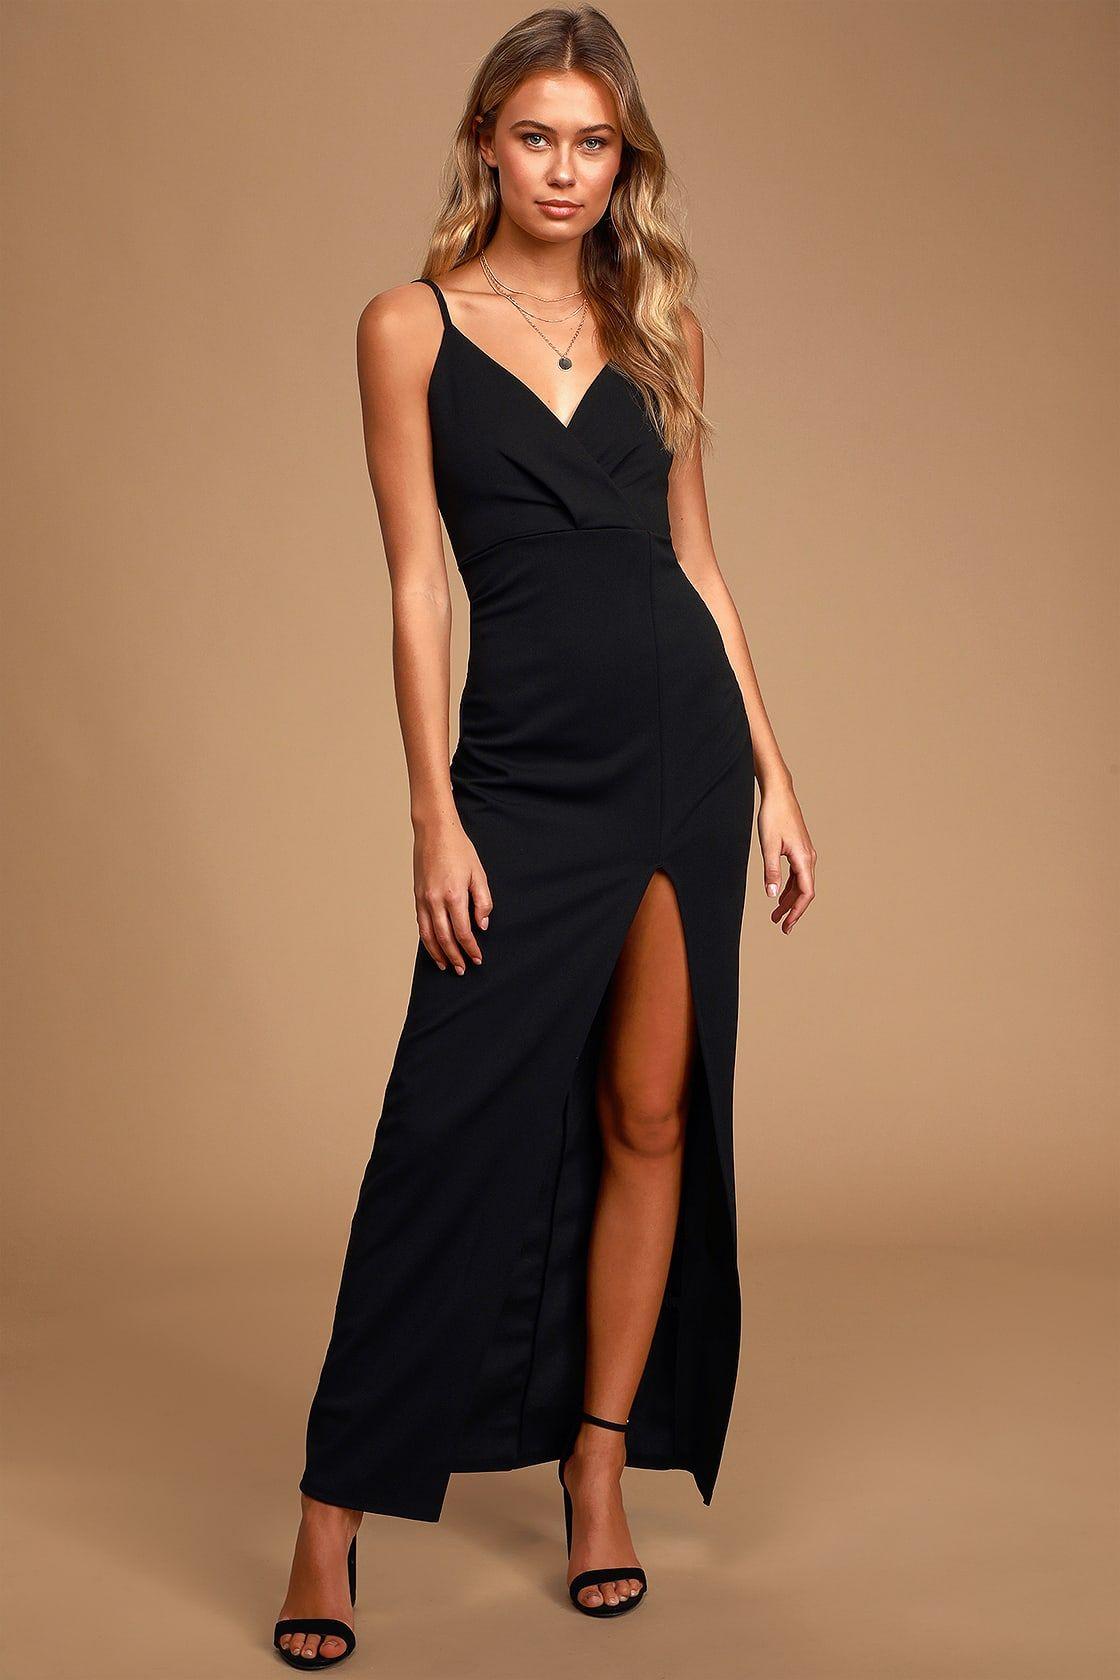 Elegant black dress maxi dress lace dress sleeveless